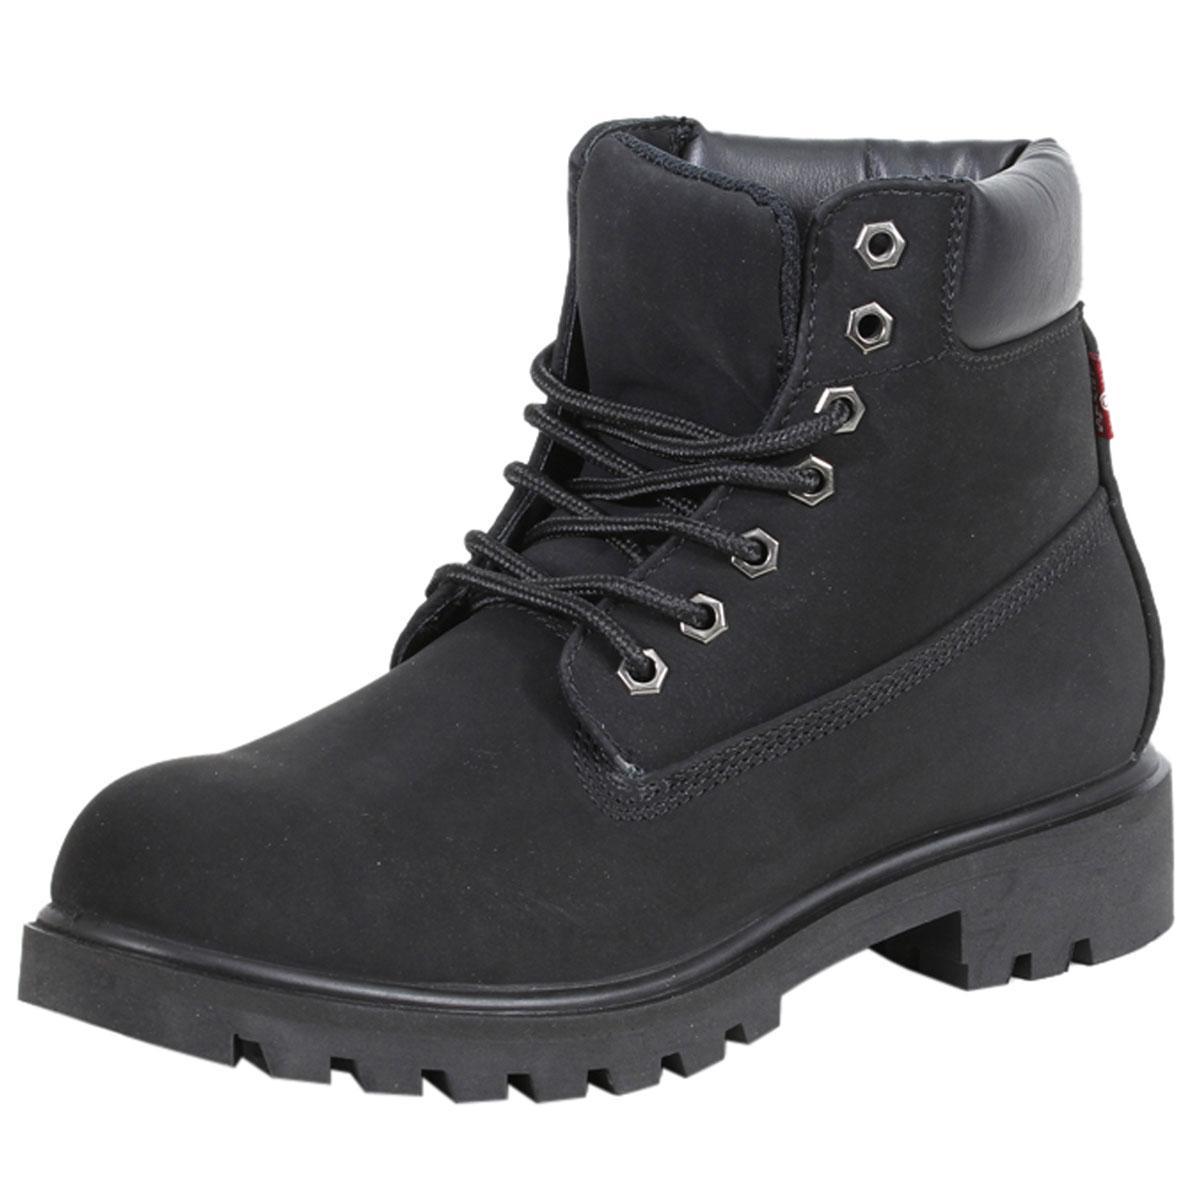 Levi's Men's Crestone INJ Boots Shoes